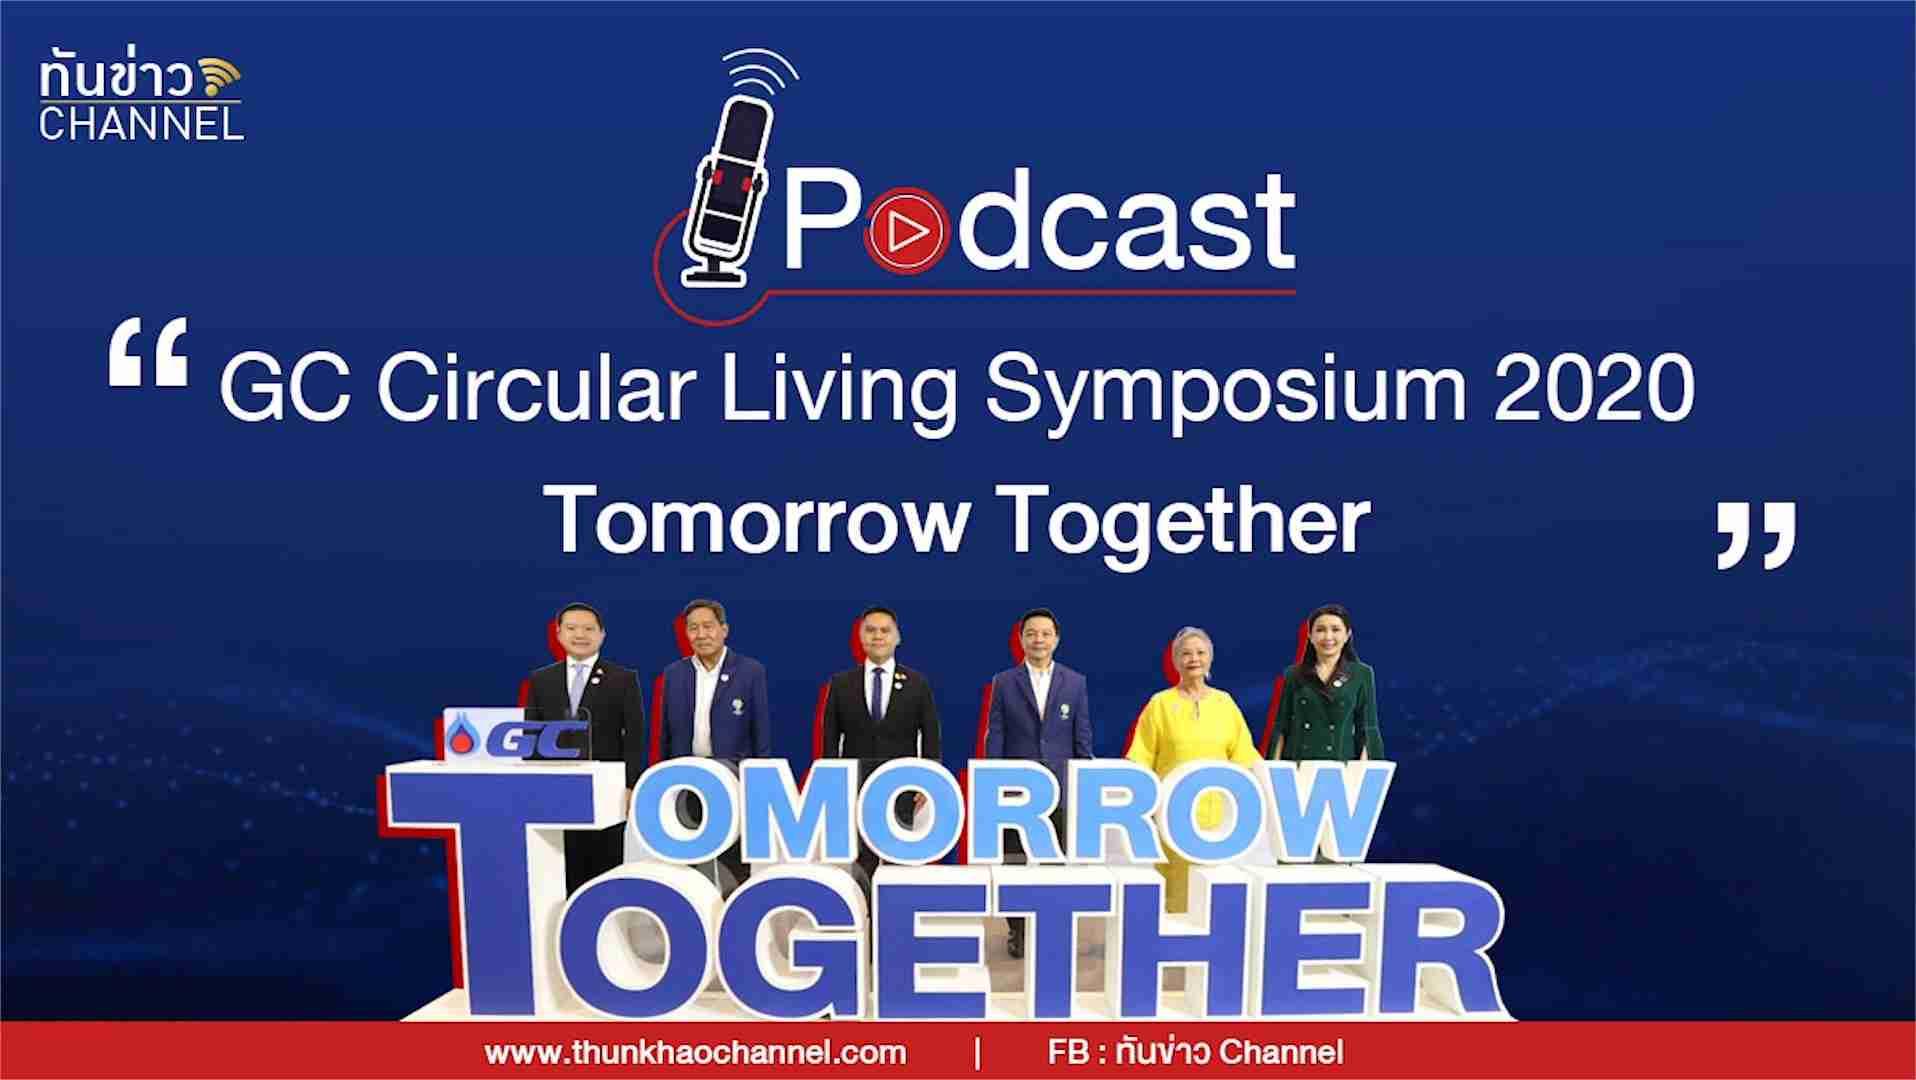 Podcast Scoop GC Circular Living Symposium 2020 : Tomorrow Together